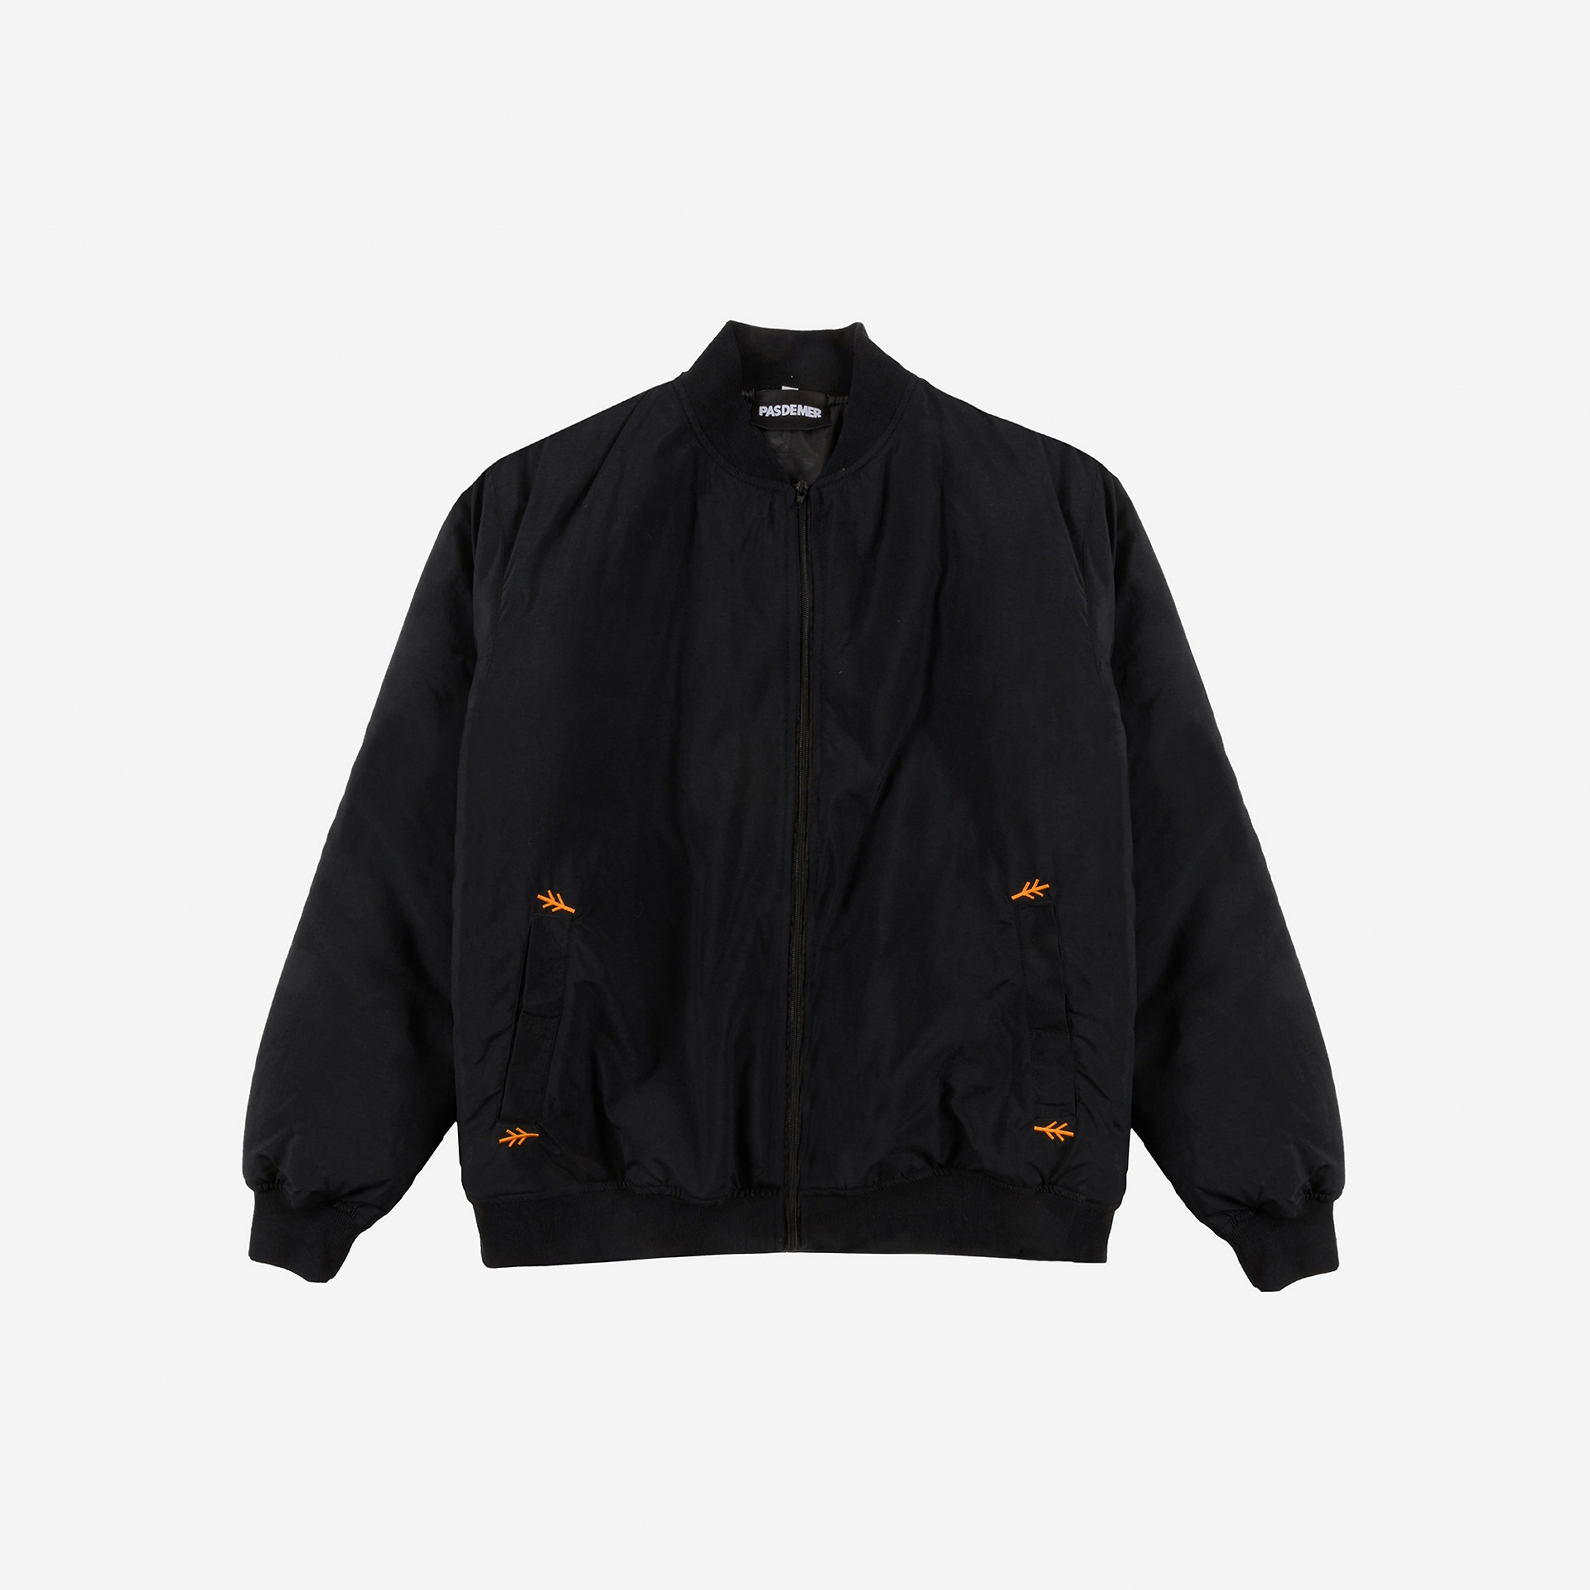 【PAS DE MER/パドゥメ】WIRE BOMBER JACKET ボンバージャケット / BLACK